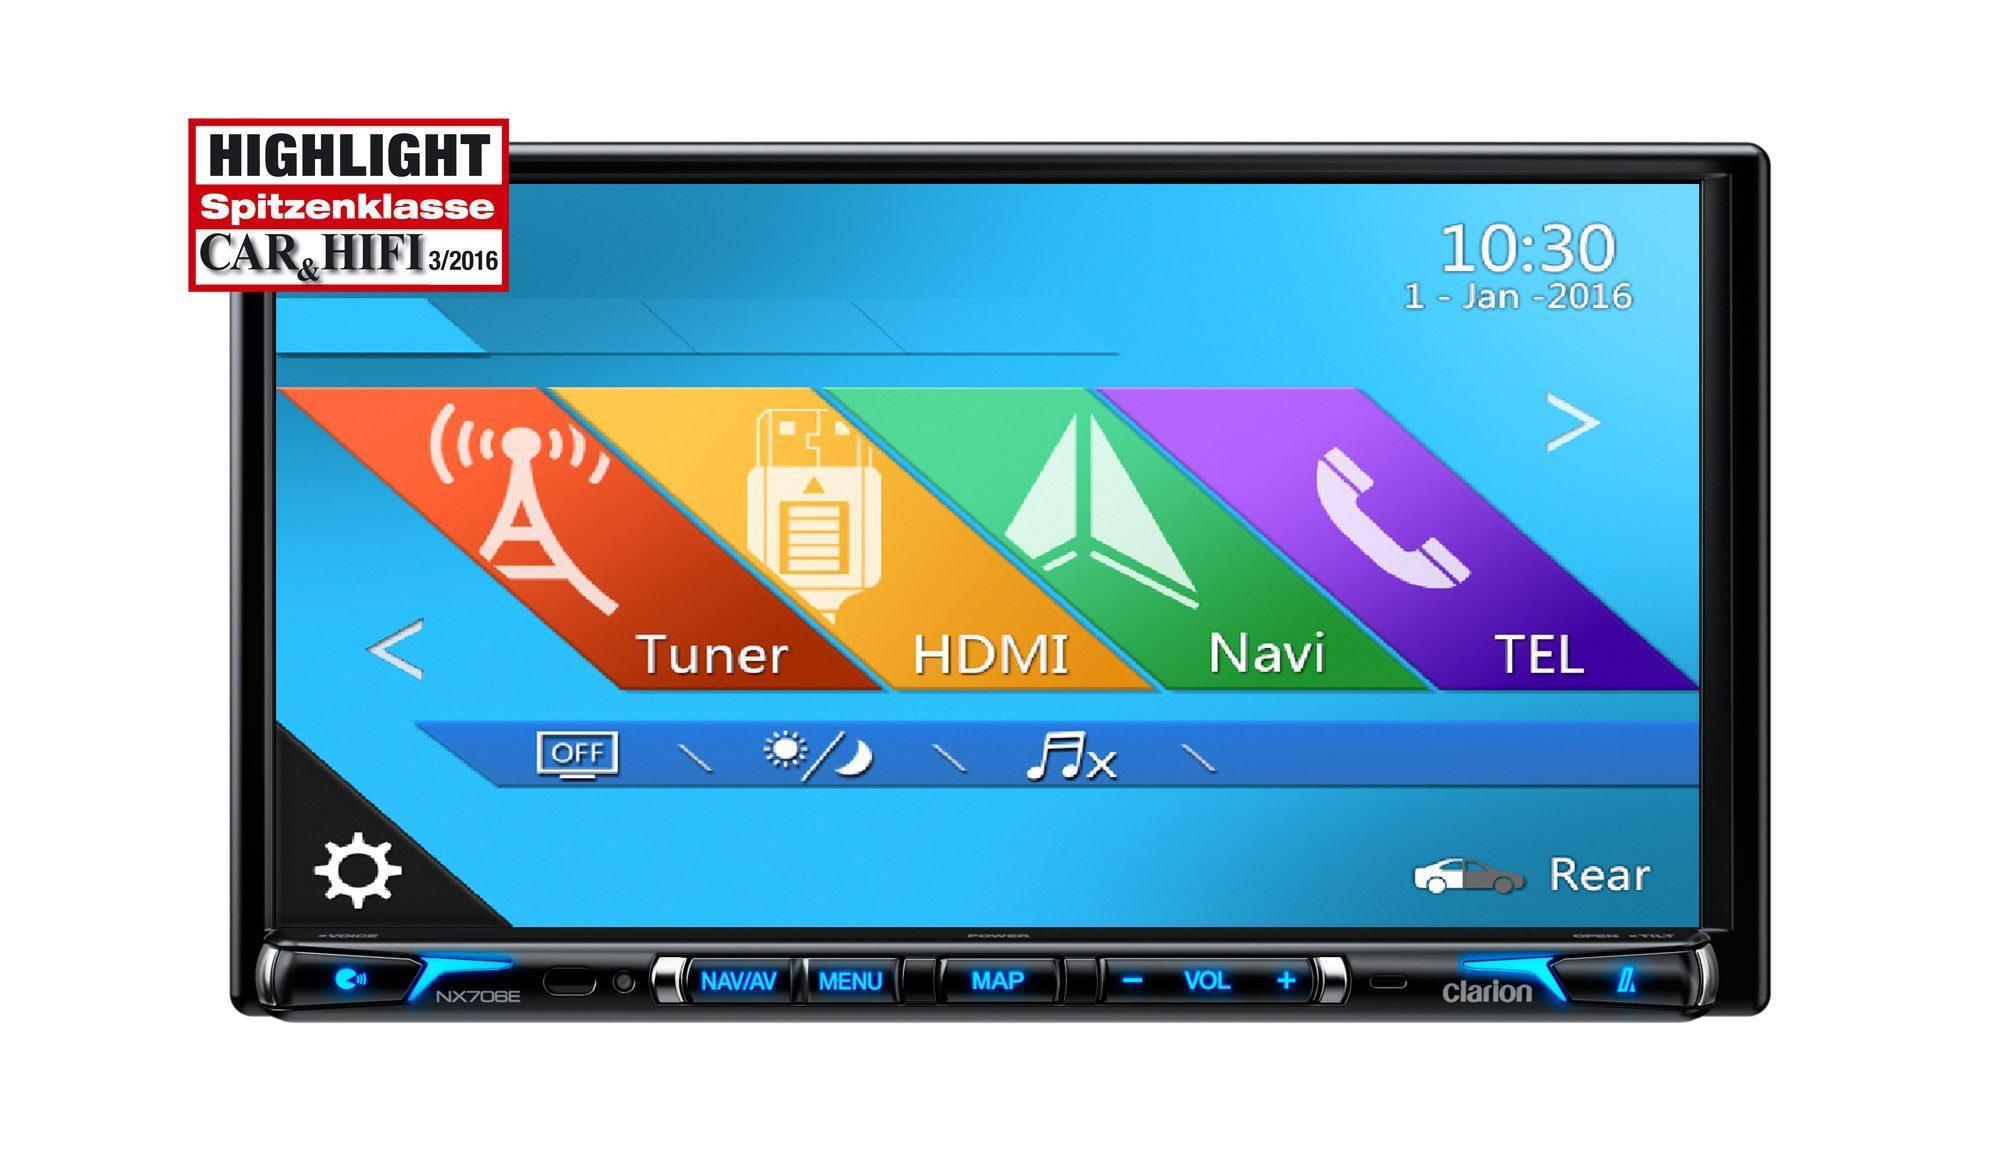 Clarion 2-DIN Multimedia mit Navi »NX706EC«